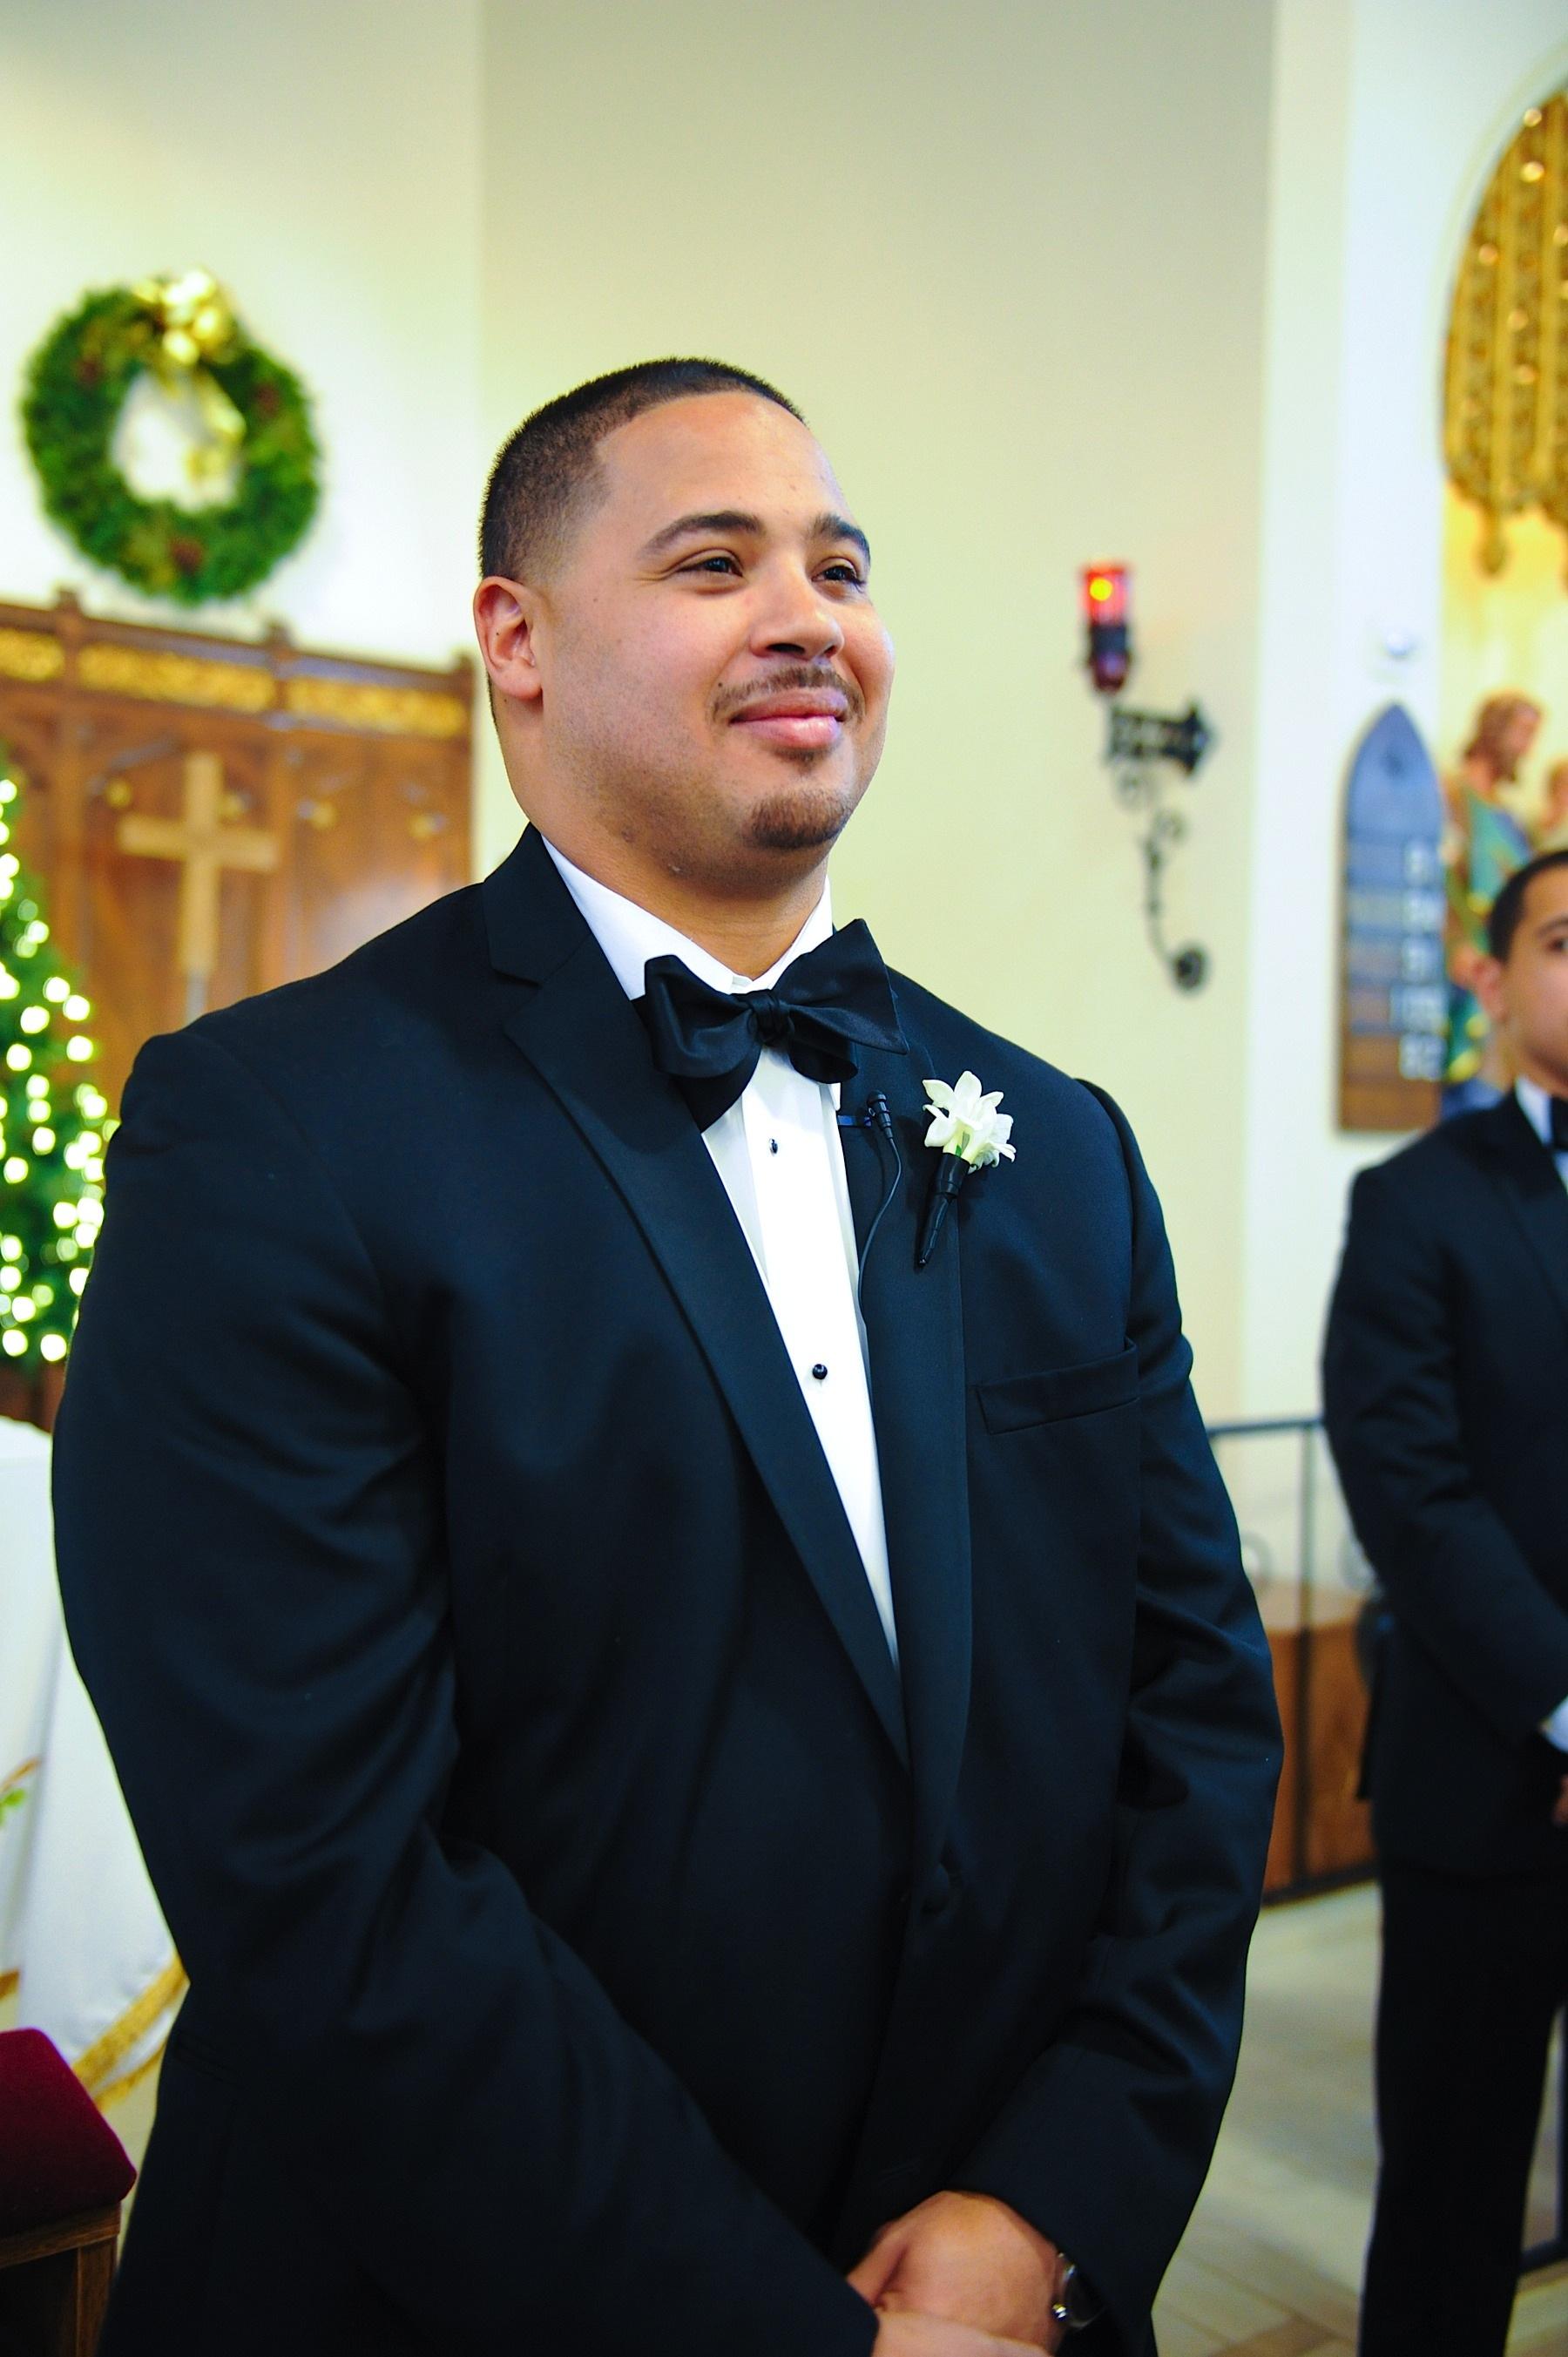 culinary_institute_of_america_napa_valley_wedding_044photographer_